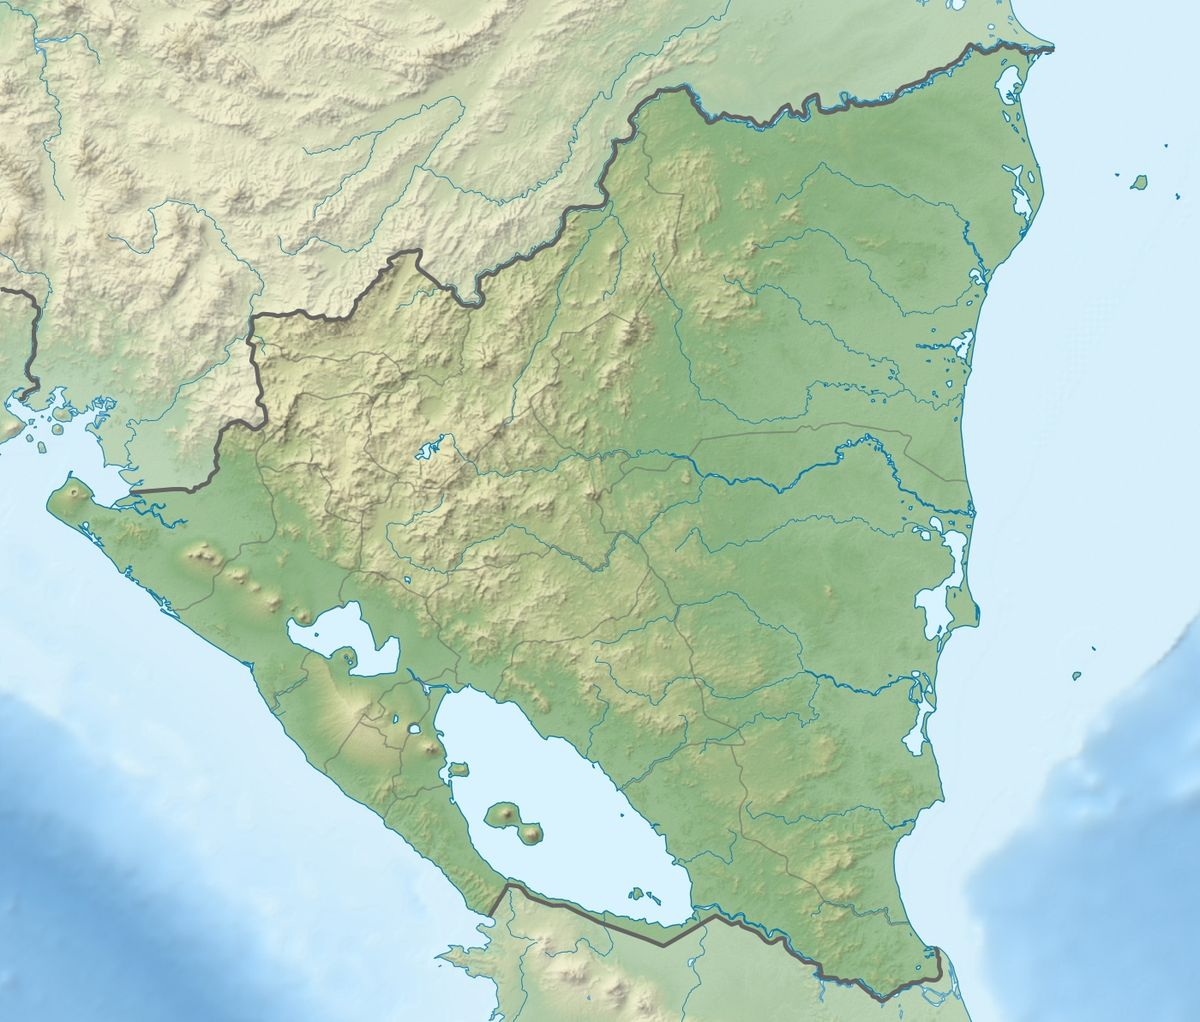 Mogotón Wikipedia - Nicaragua location on world map